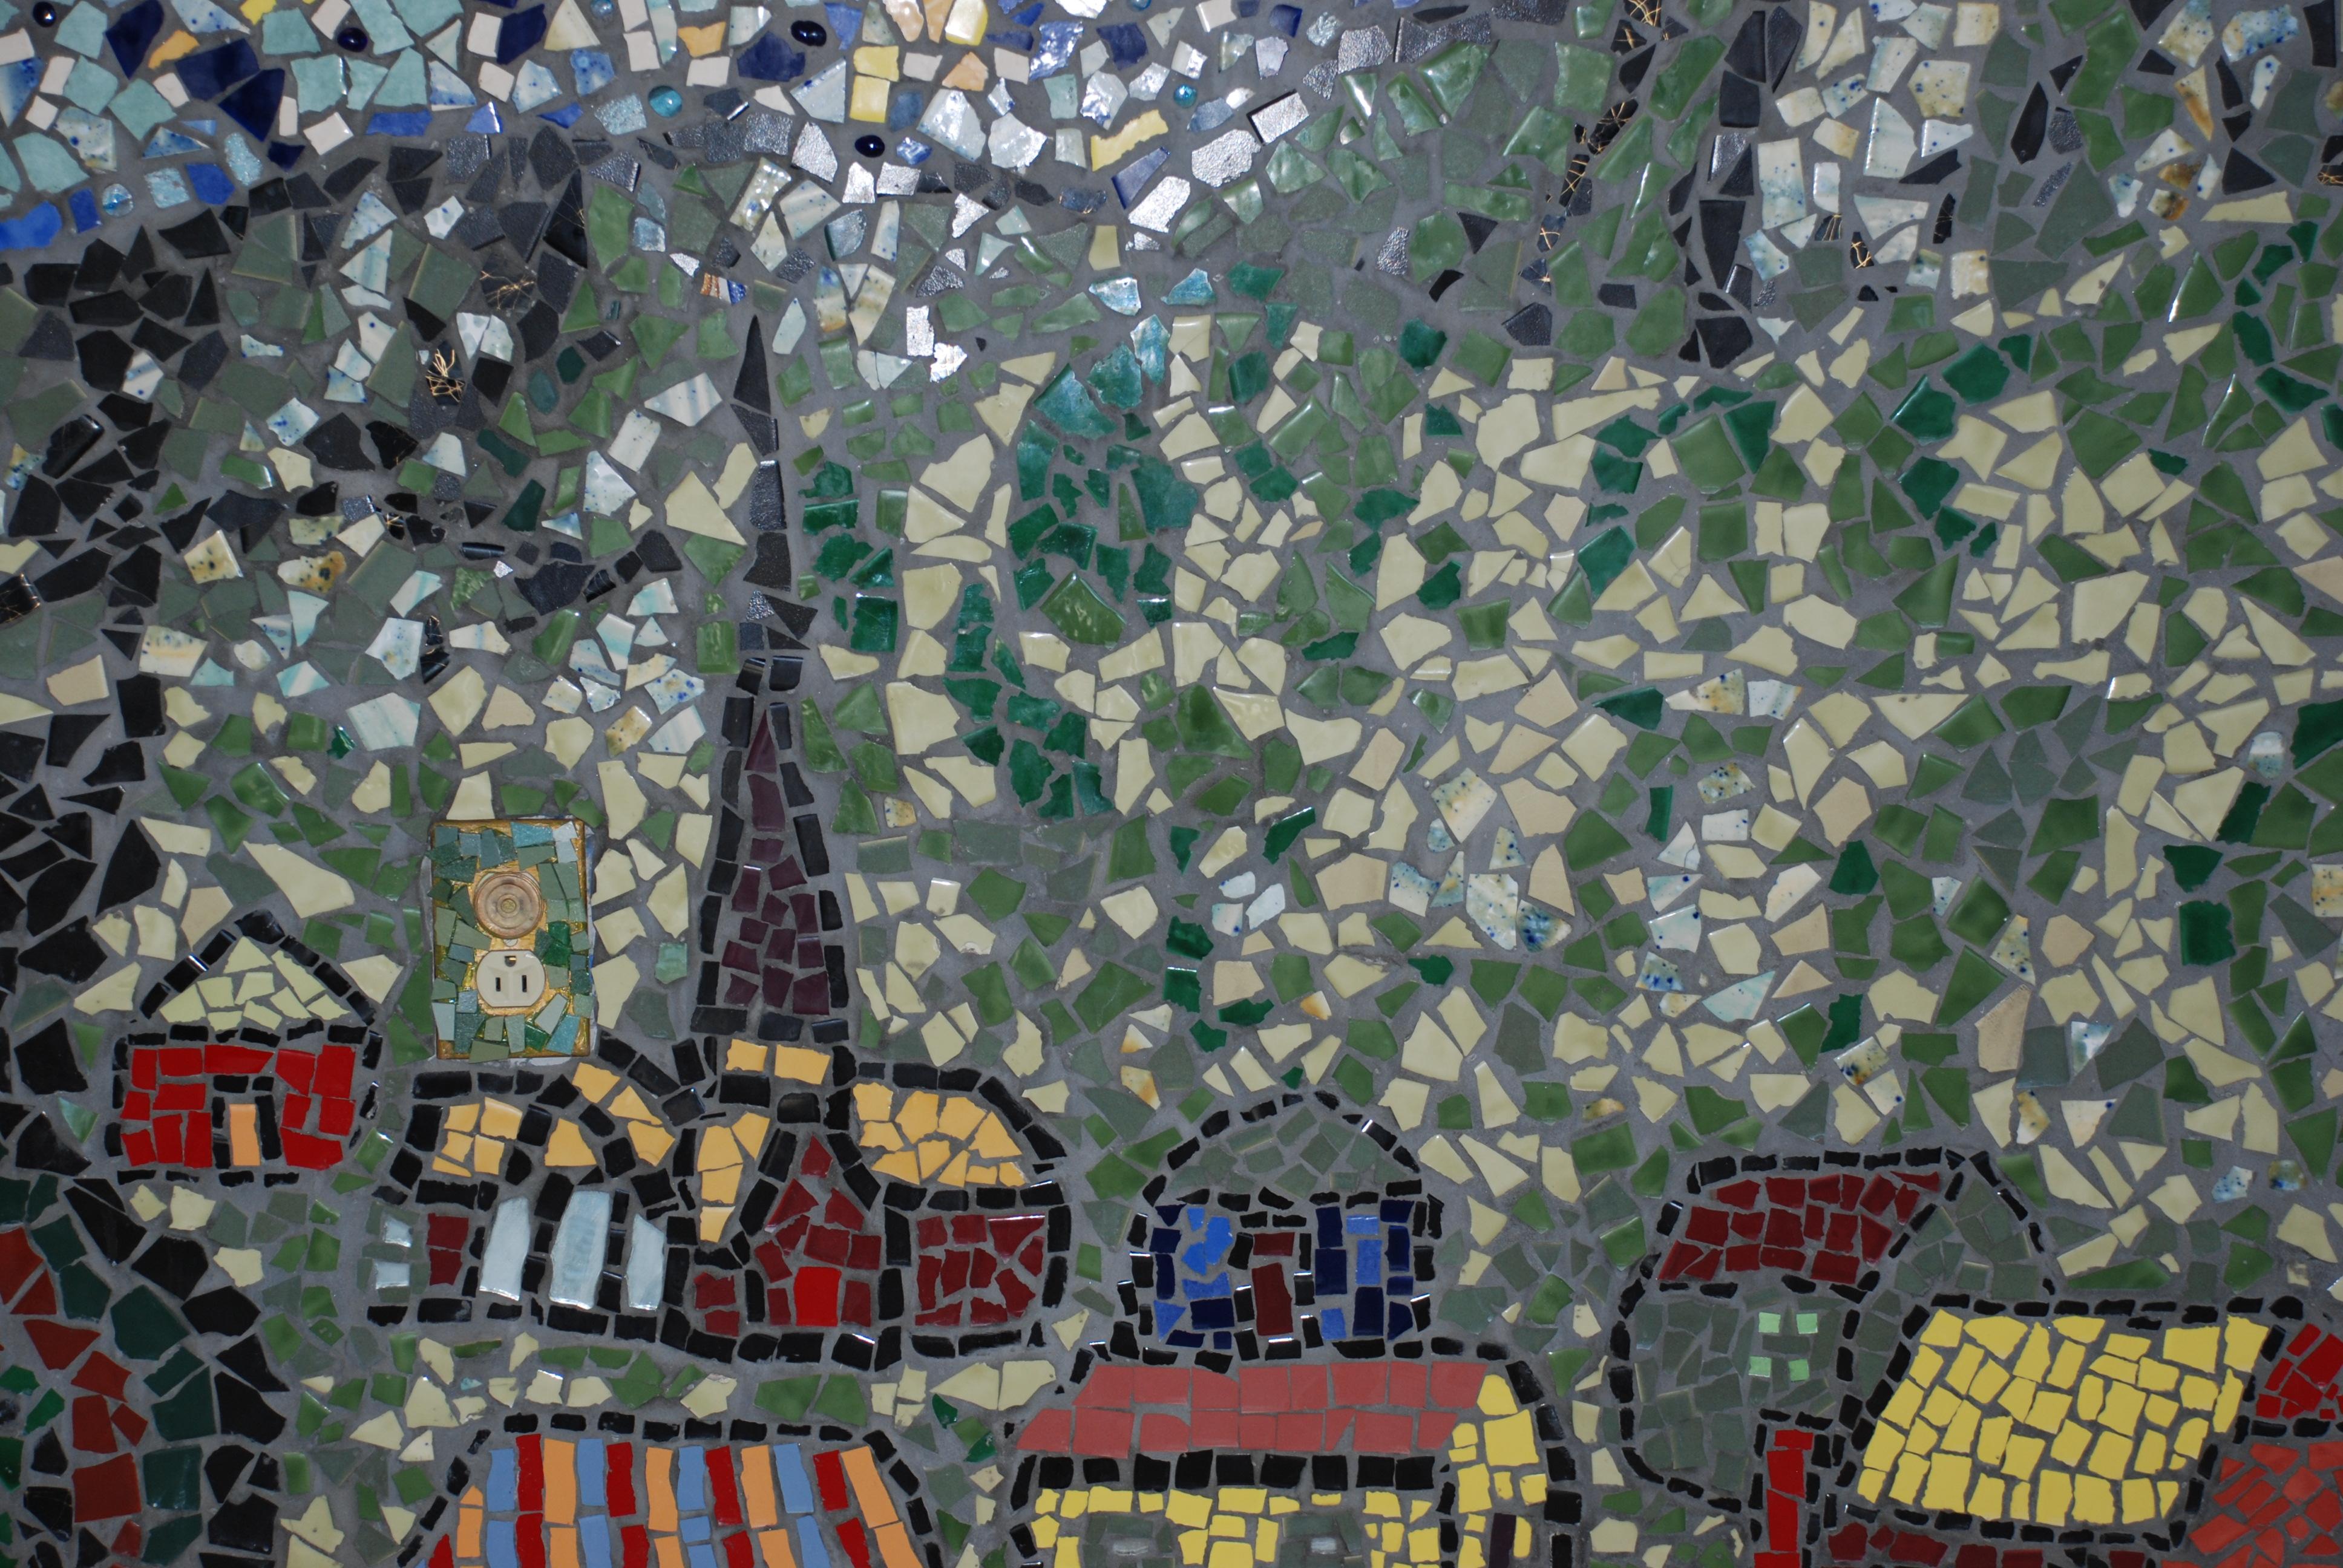 van goghs starry night mosaic mural